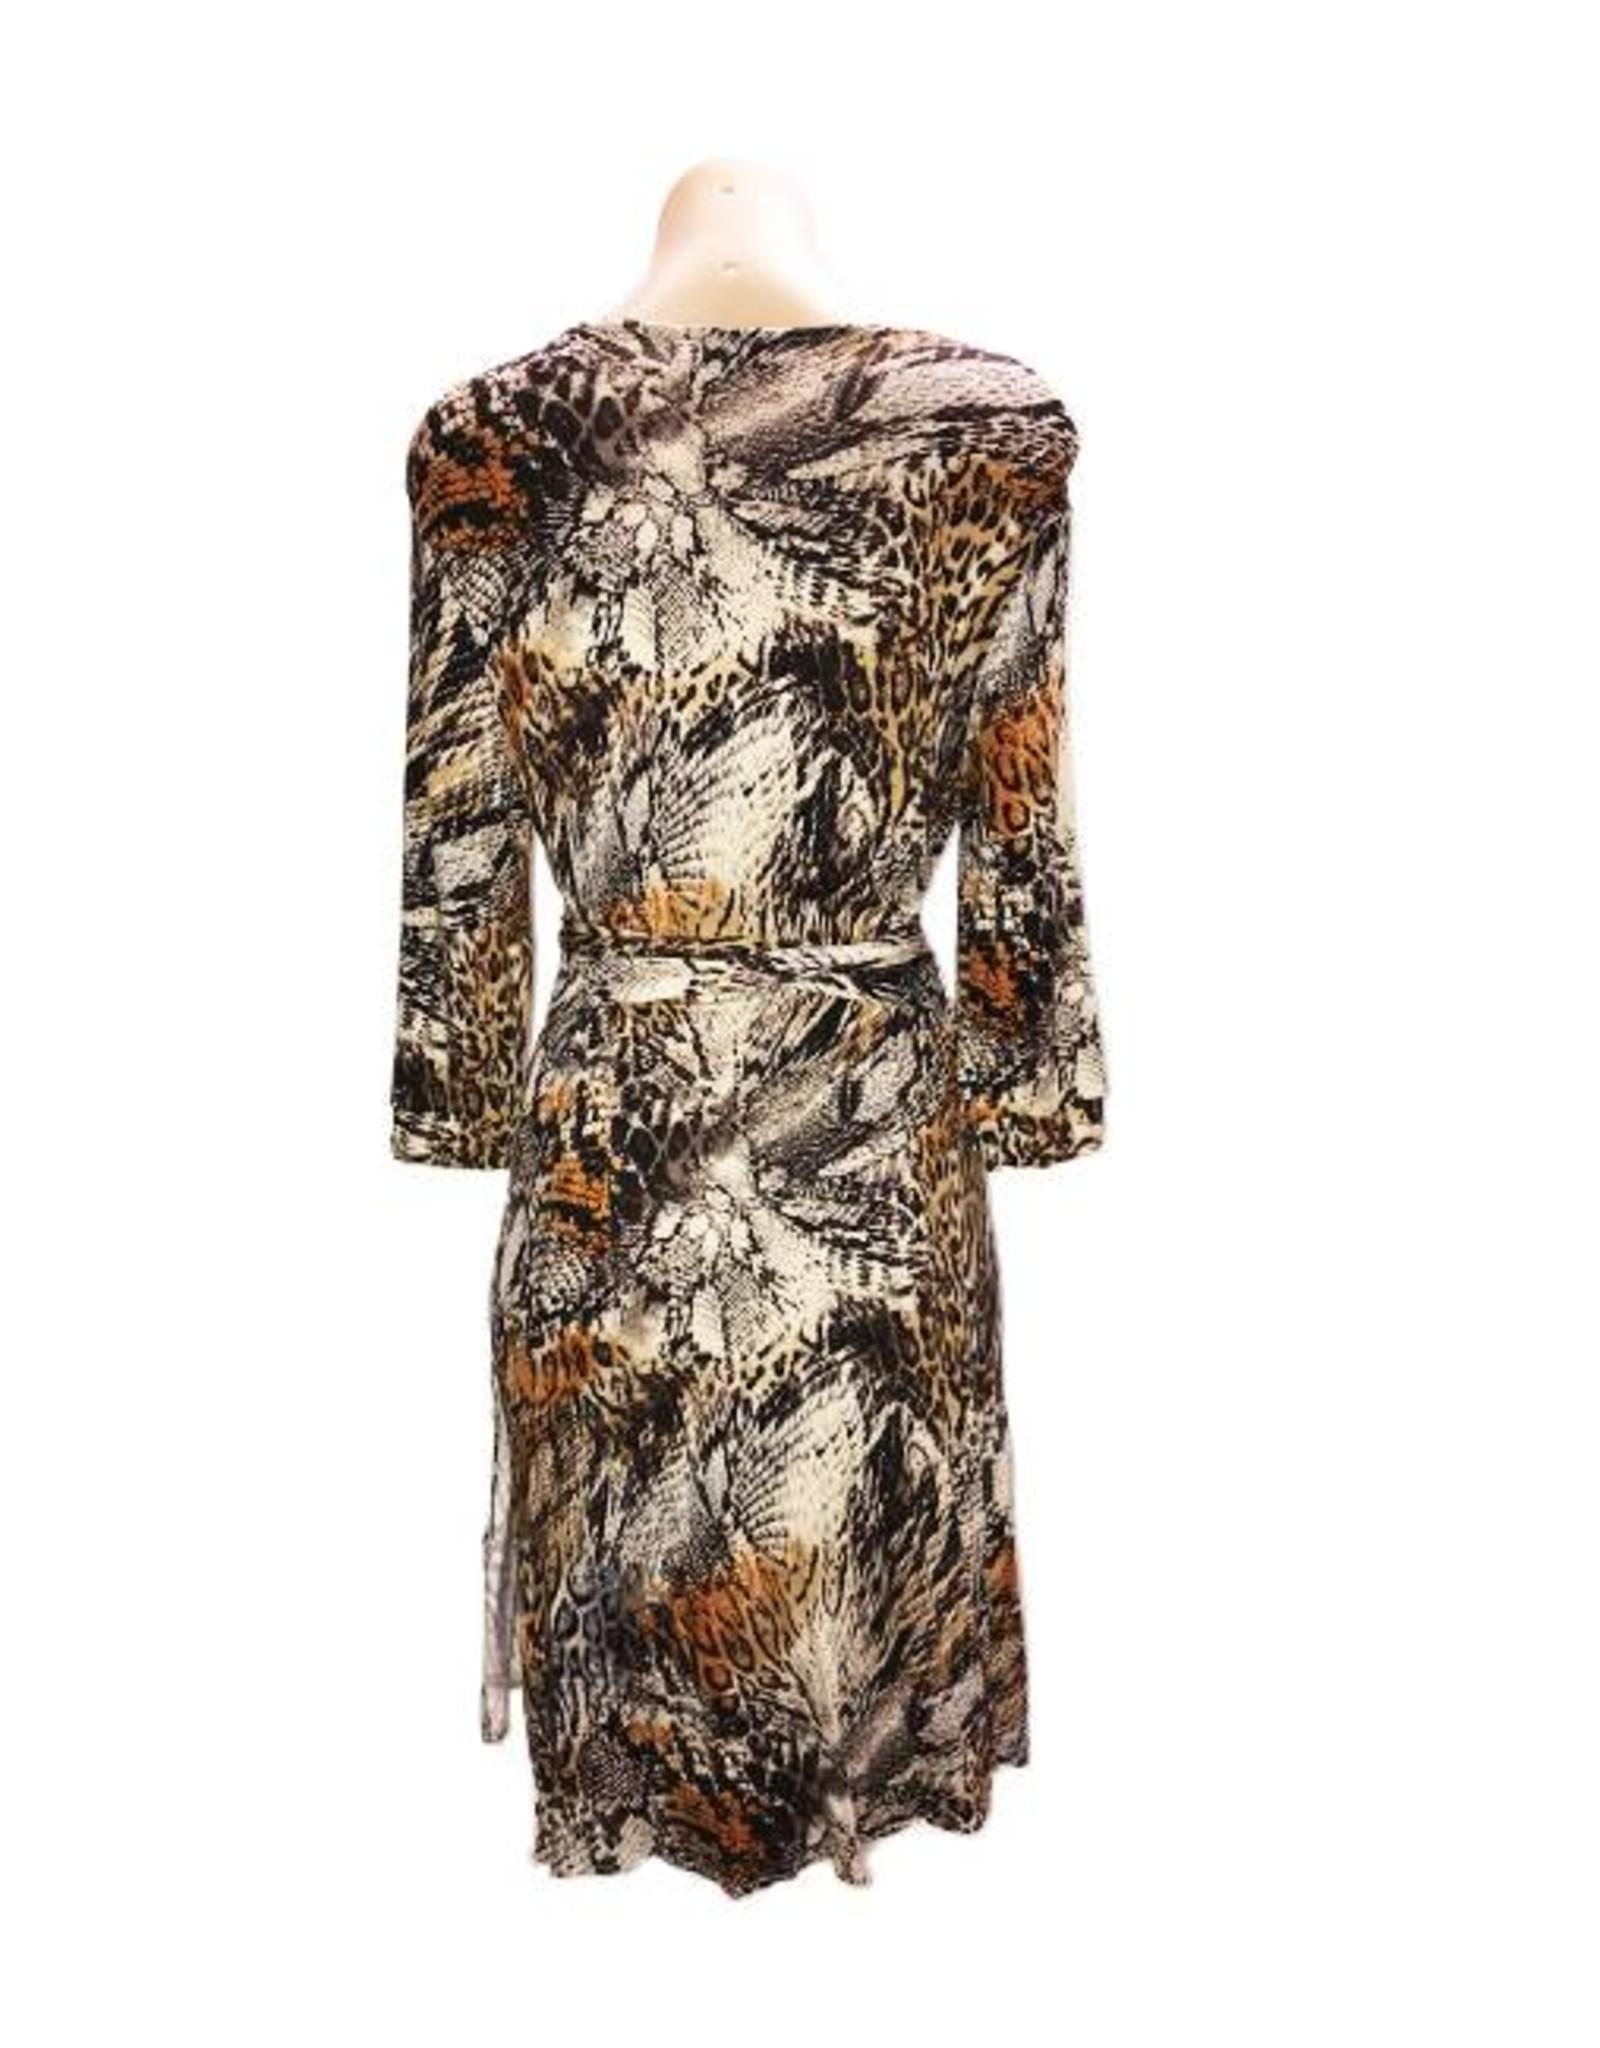 Anaconda Wrap Dress in Brown